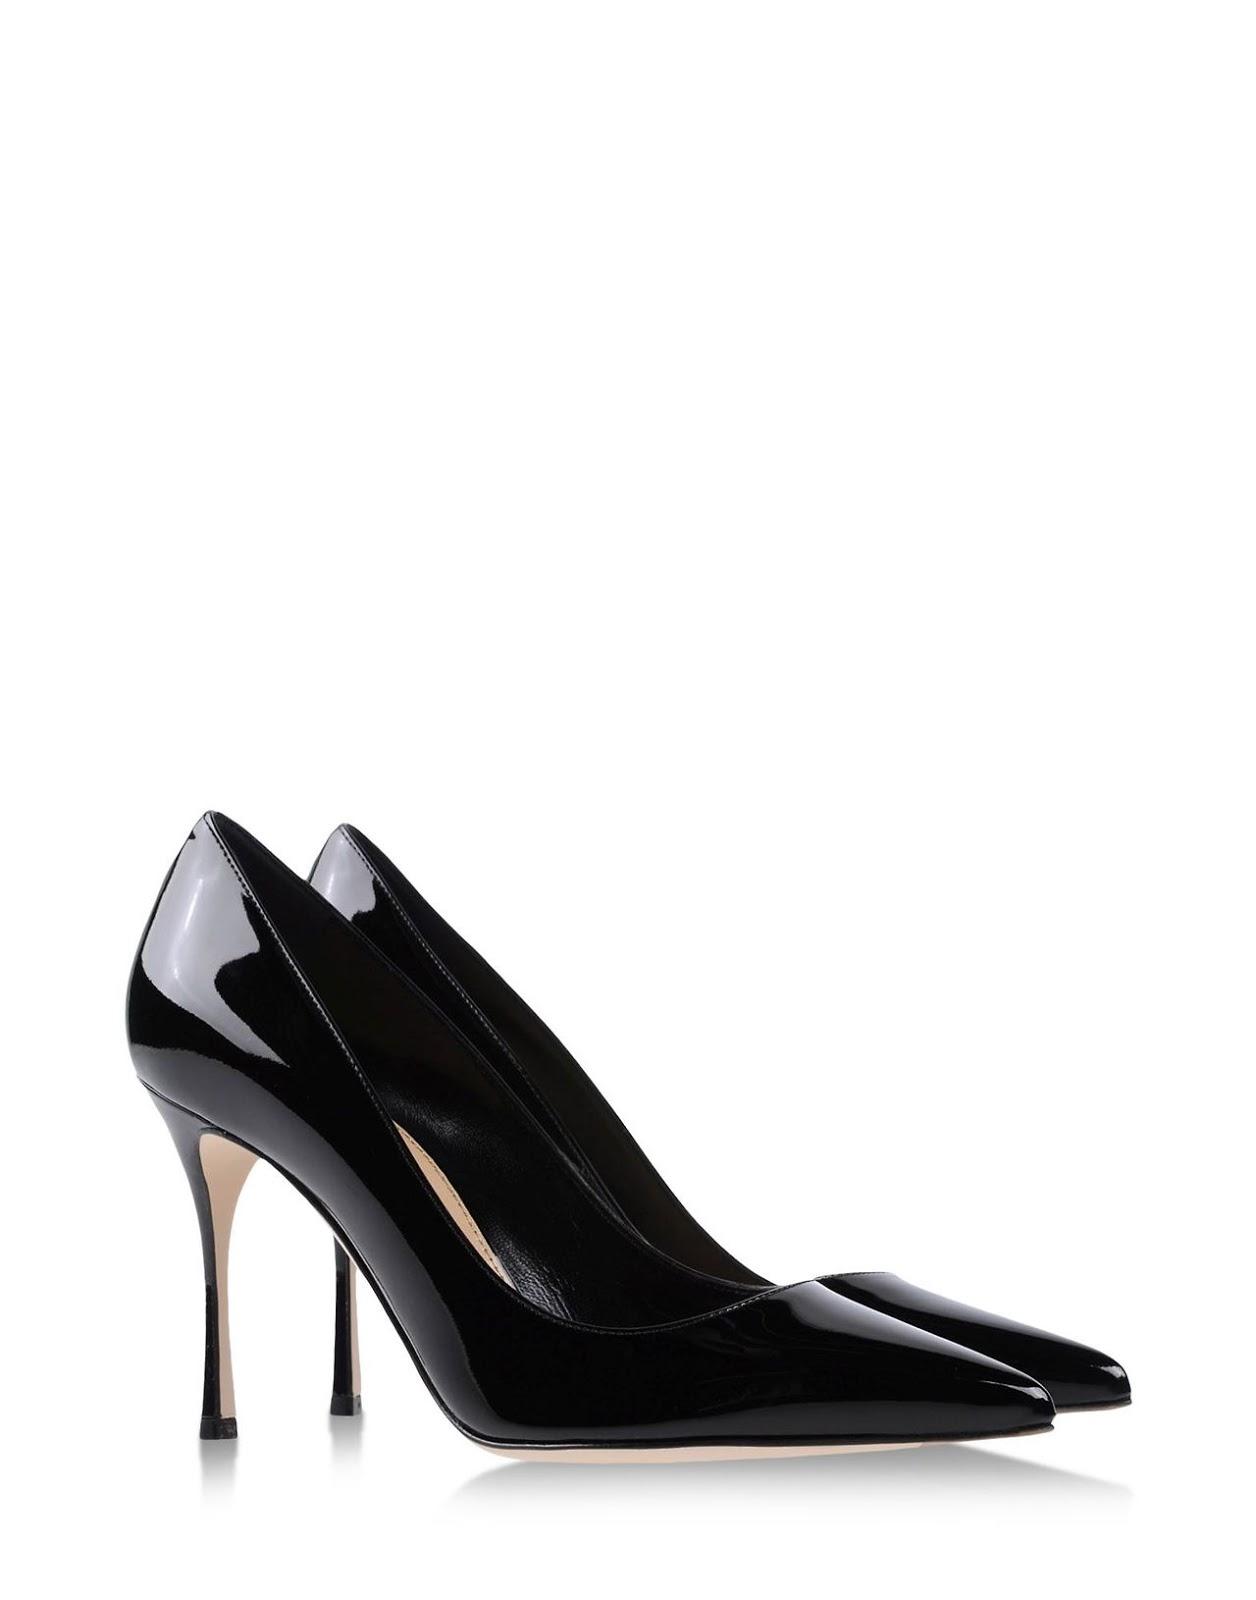 Catalogo de zapatos elegantes fant sticos zapatos for Zapateros elegantes